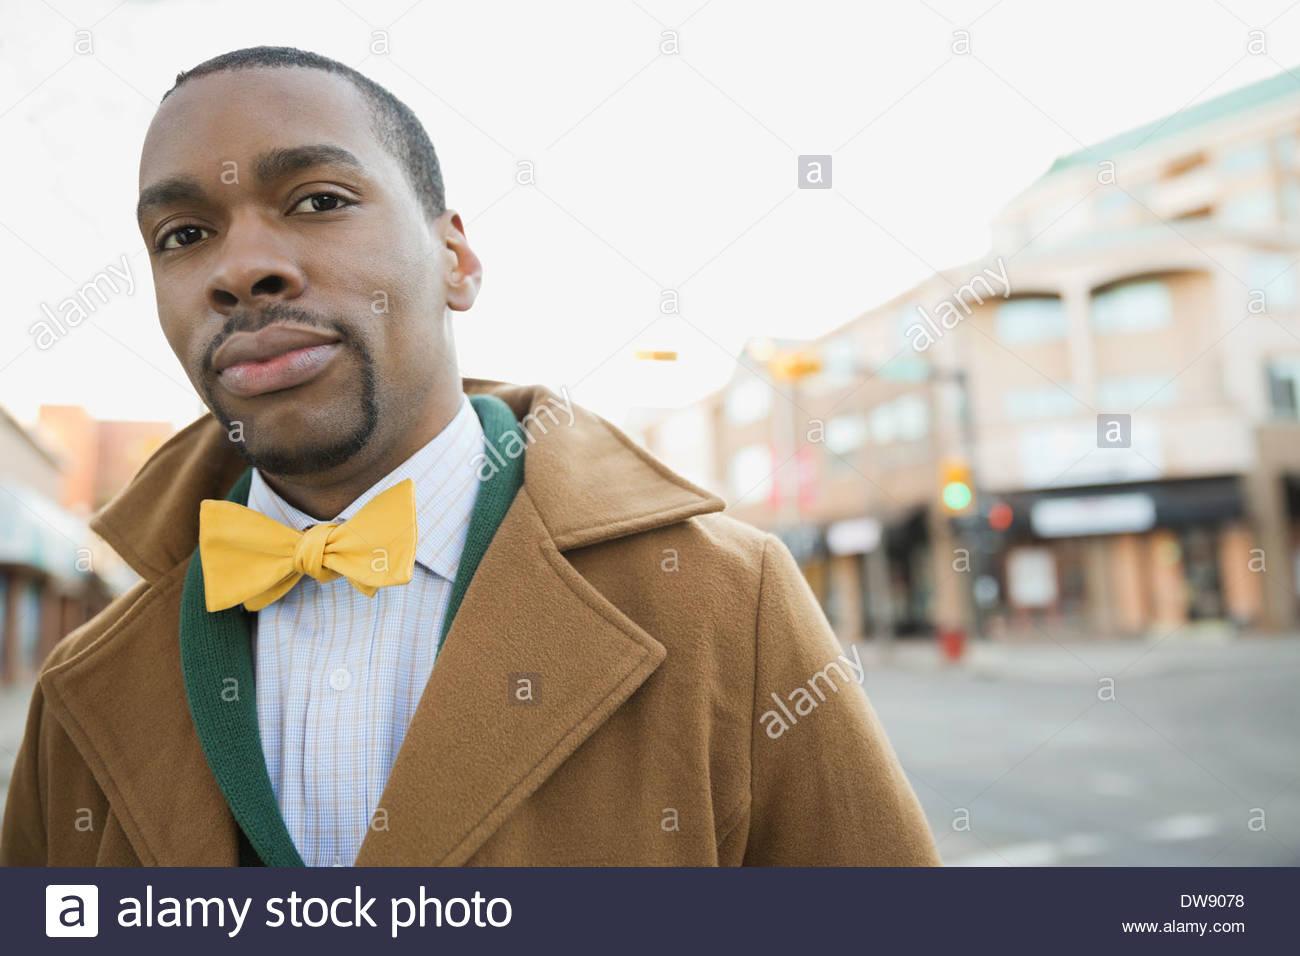 Portrait of confident man on city street - Stock Image